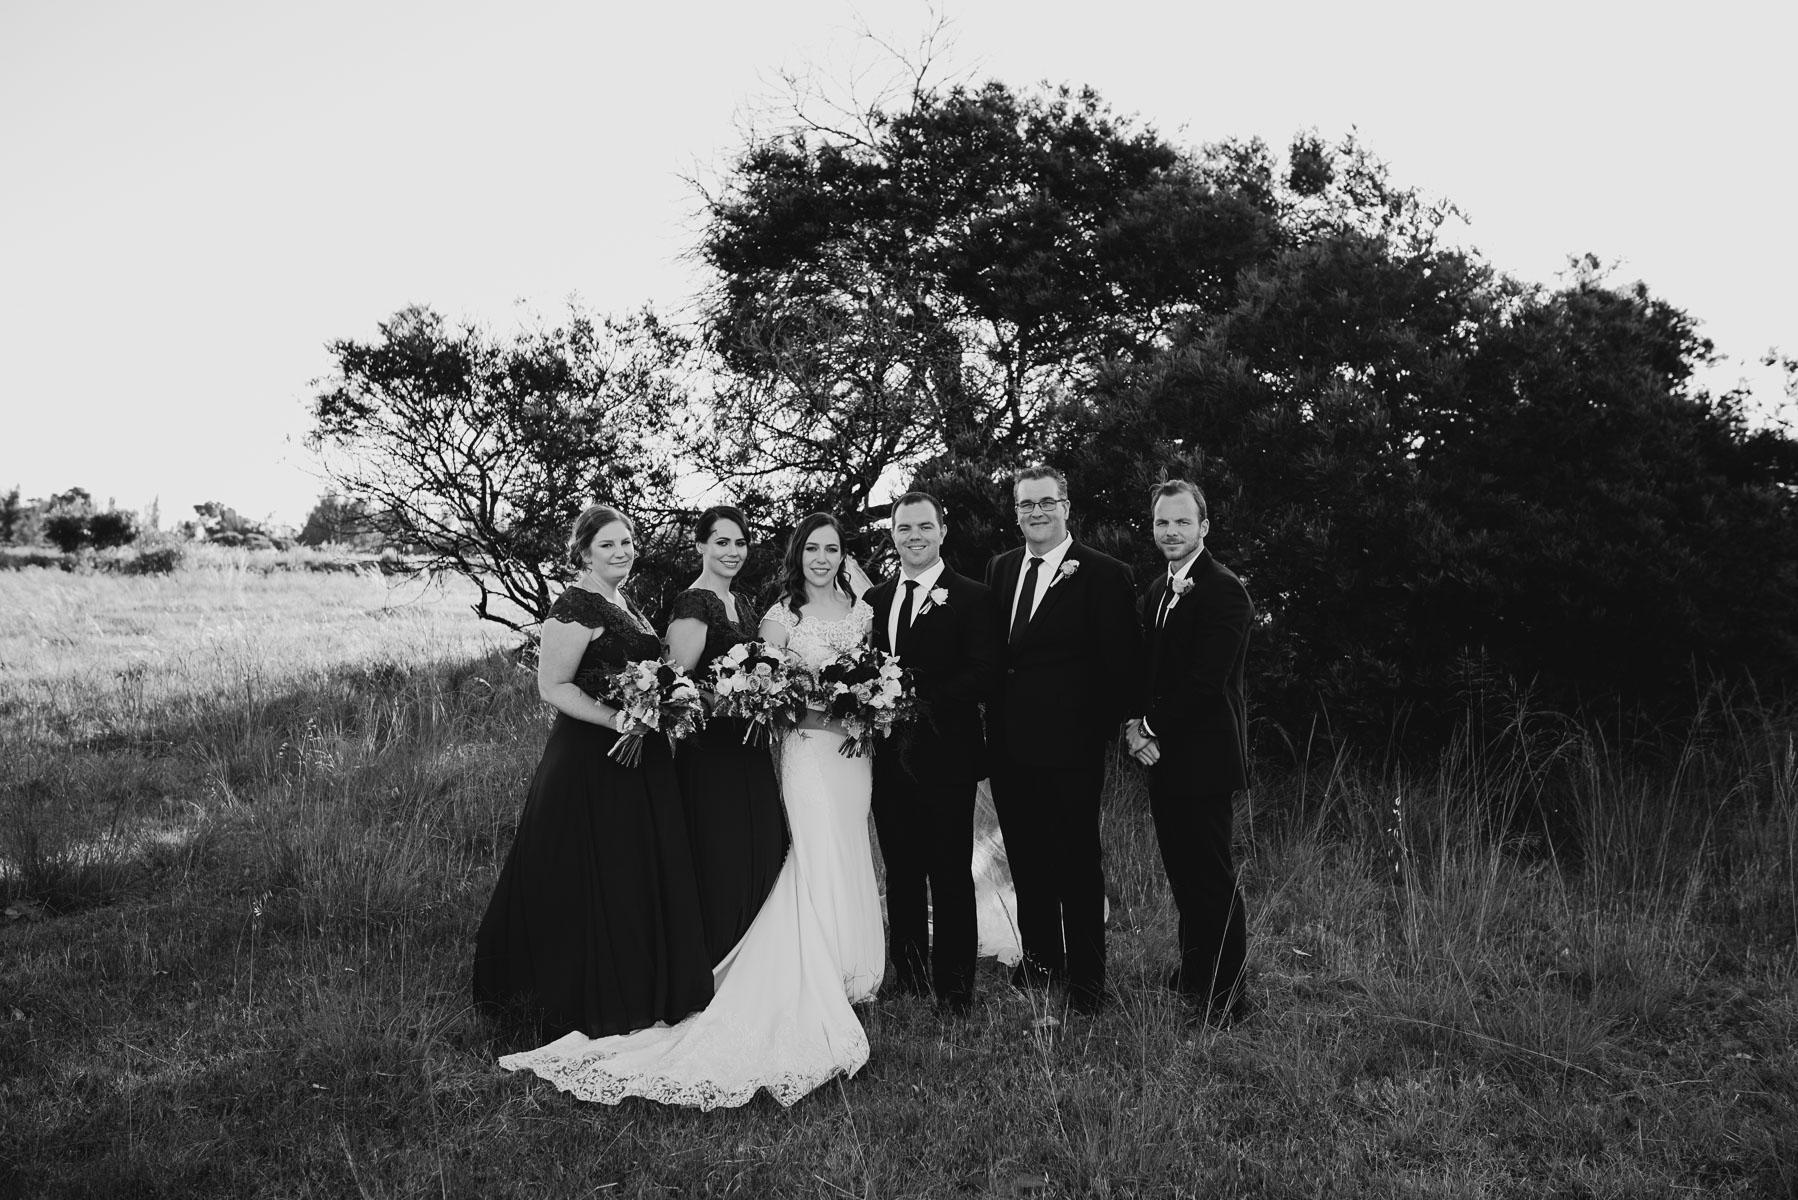 paige-john-chapel-farm-wedding-46.JPG